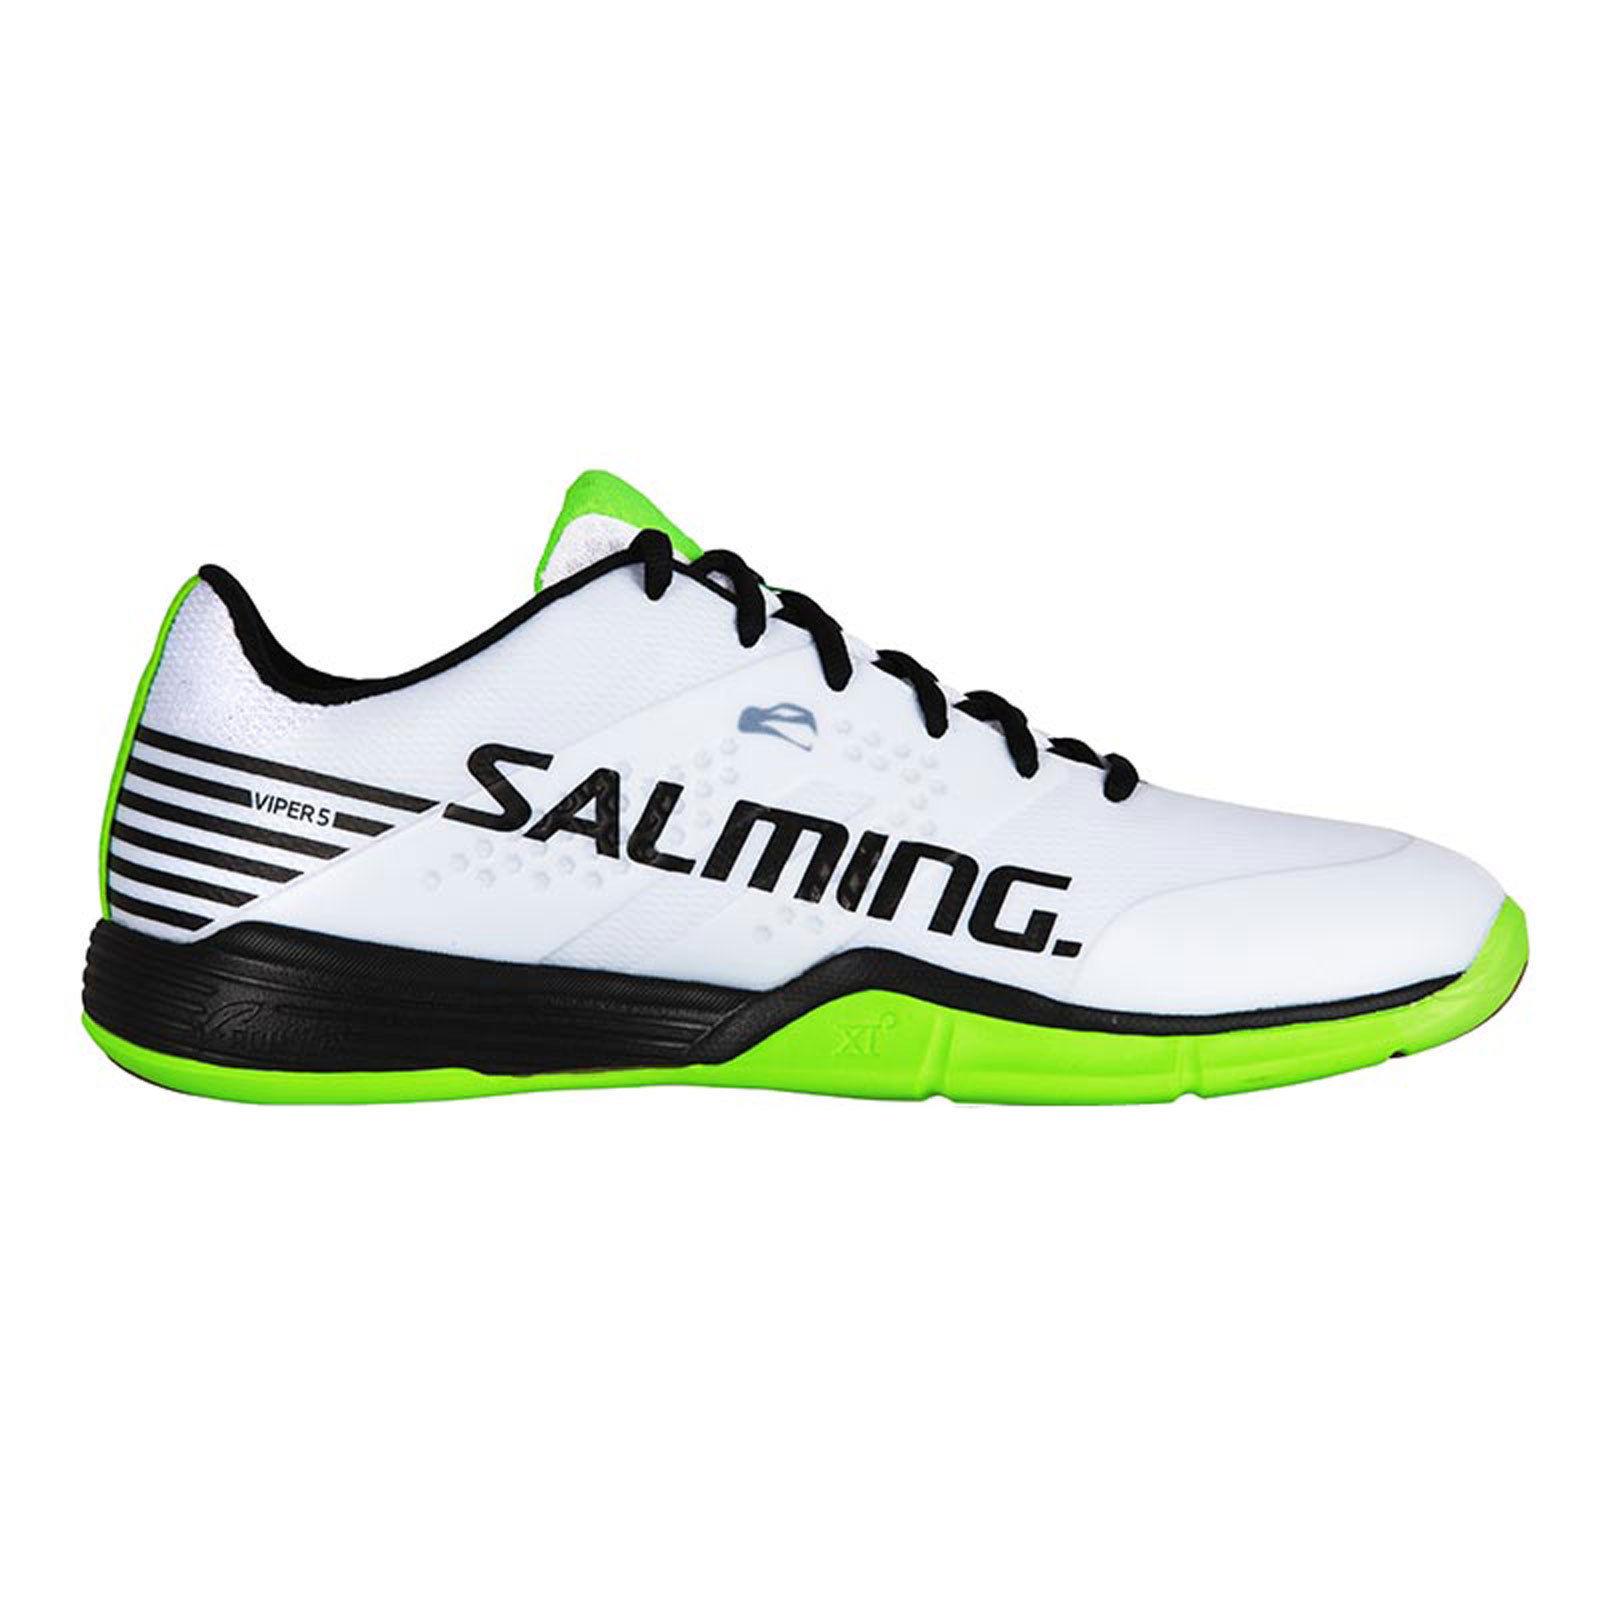 Salming Viper 5 Men Indoor Handball Sport Shoes Trainers white 1238071 0701 WOW